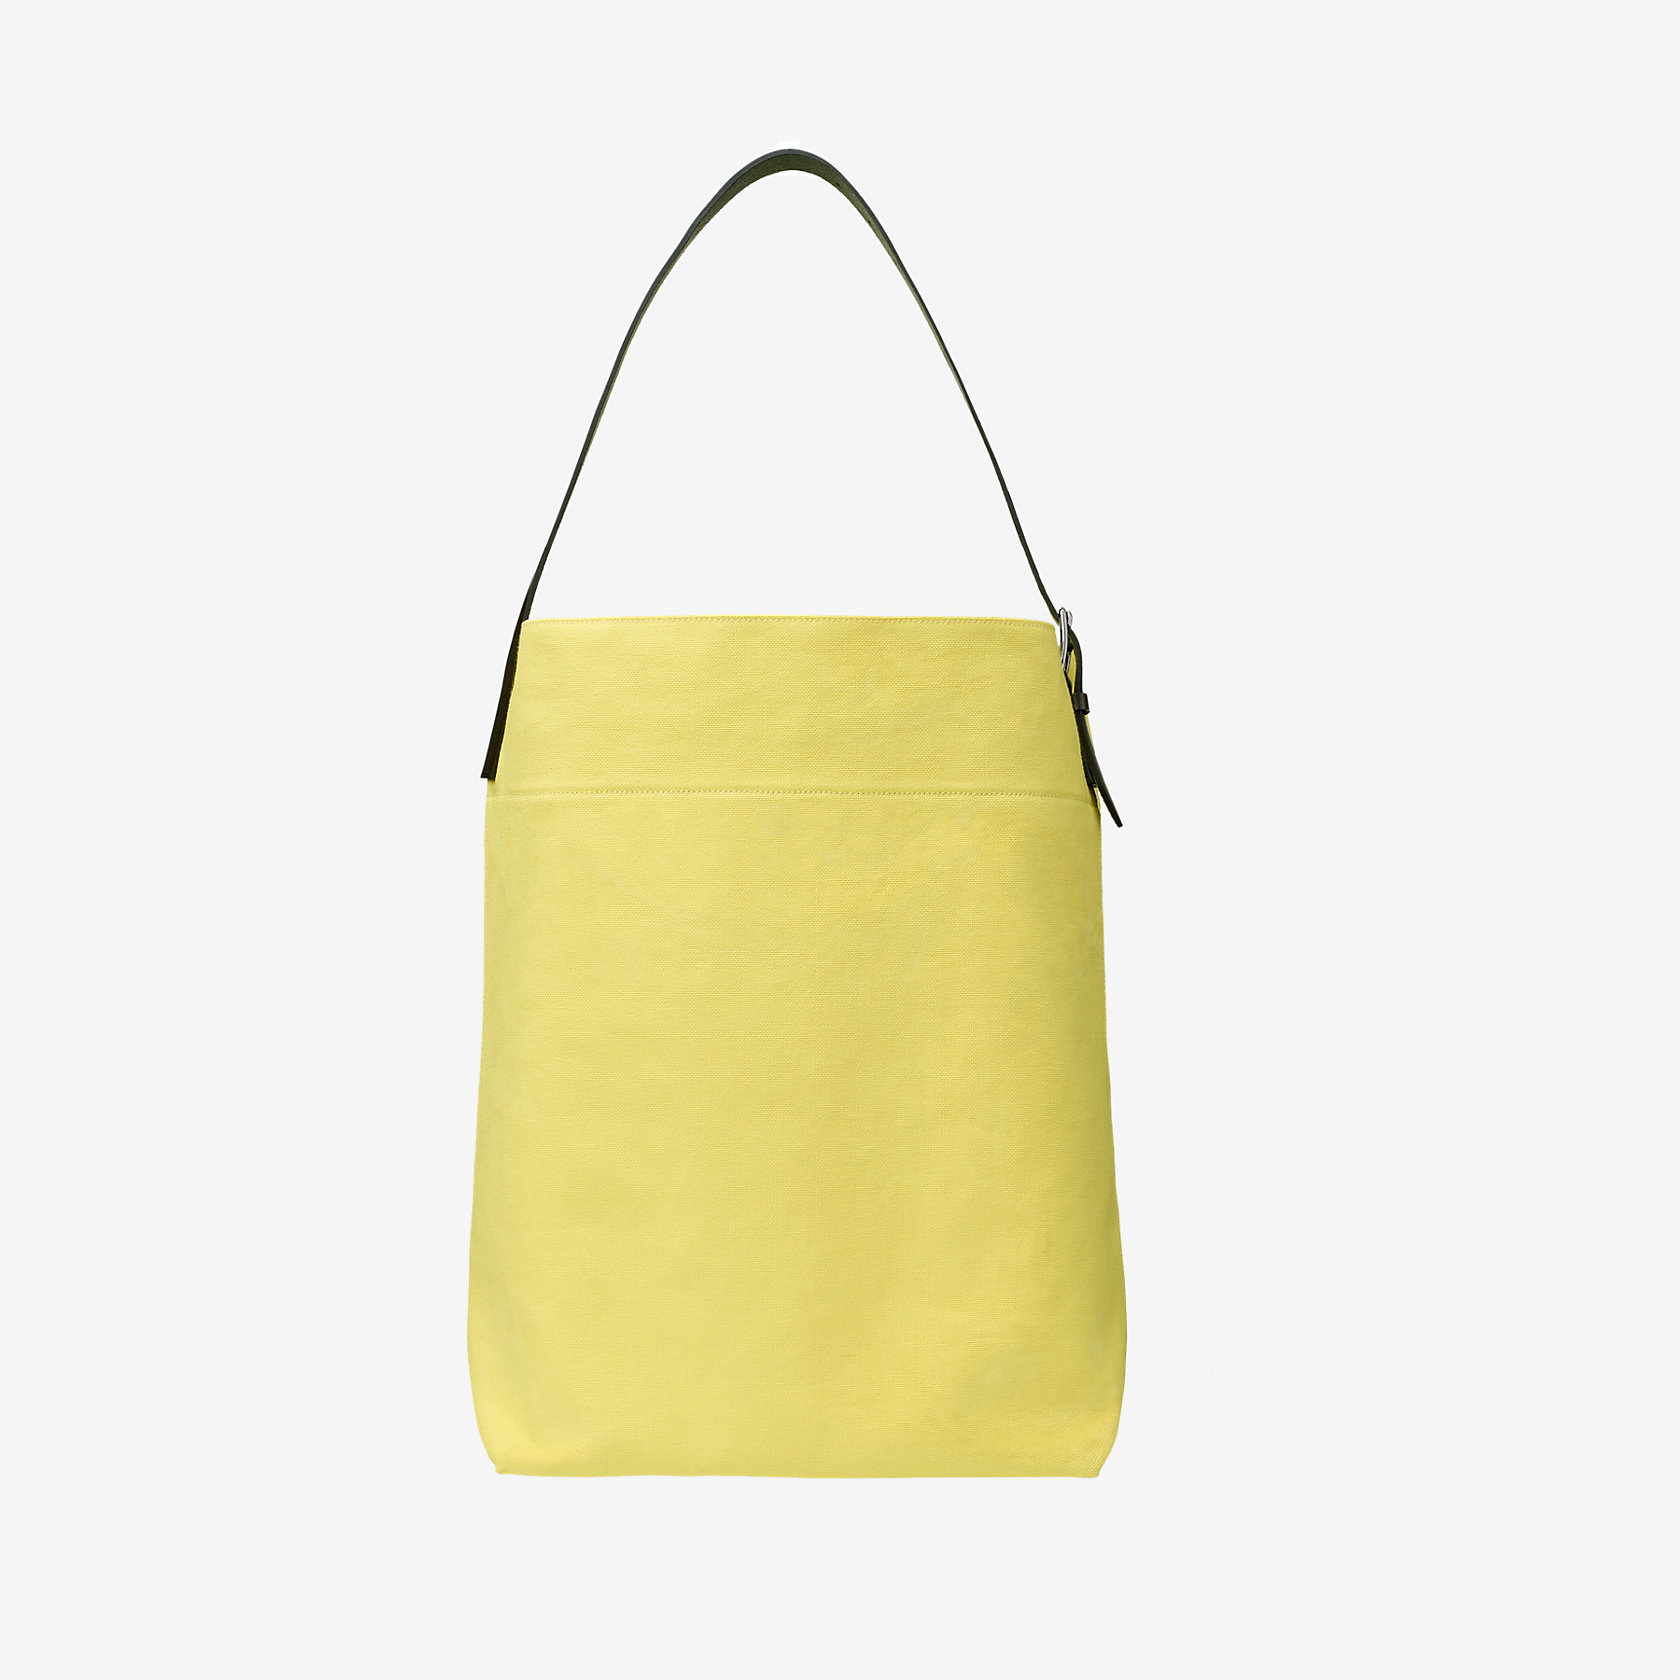 Ekta Bags Part 1154 Tendencies Sling Bag Twin Side Pocket Burgundy Maroon Womens Yellow Double Bow Handbags For Women School College Holiday Shoulder Tote Grab 2